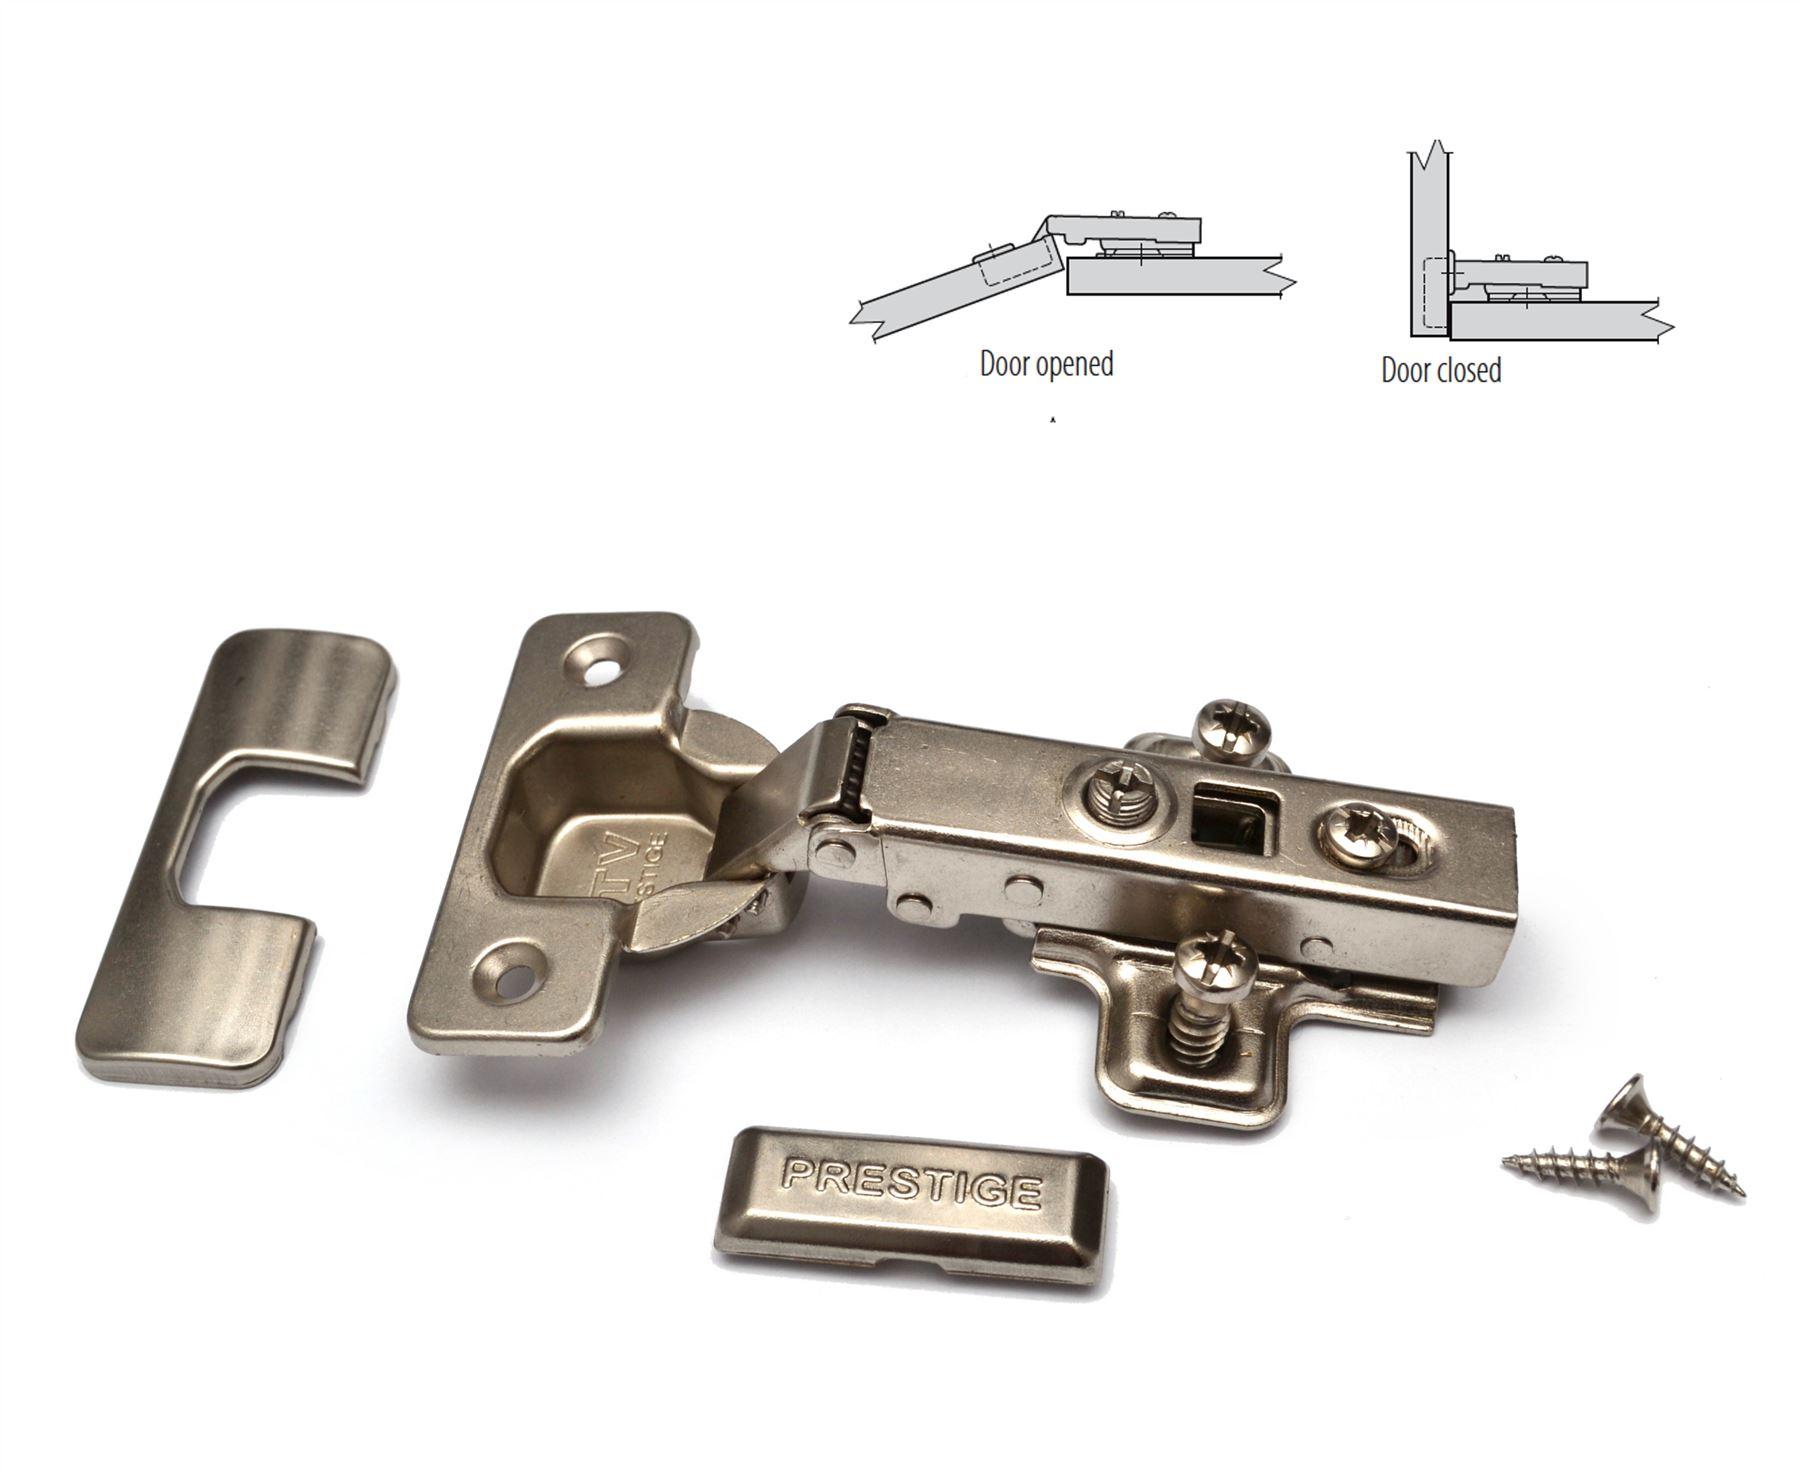 Door-Hinge-GTV-Soft-Close-35mm-PRESTIGE-With-  sc 1 st  eBay & Door Hinge GTV Soft Close 35mm PRESTIGE With EURO Screws | eBay